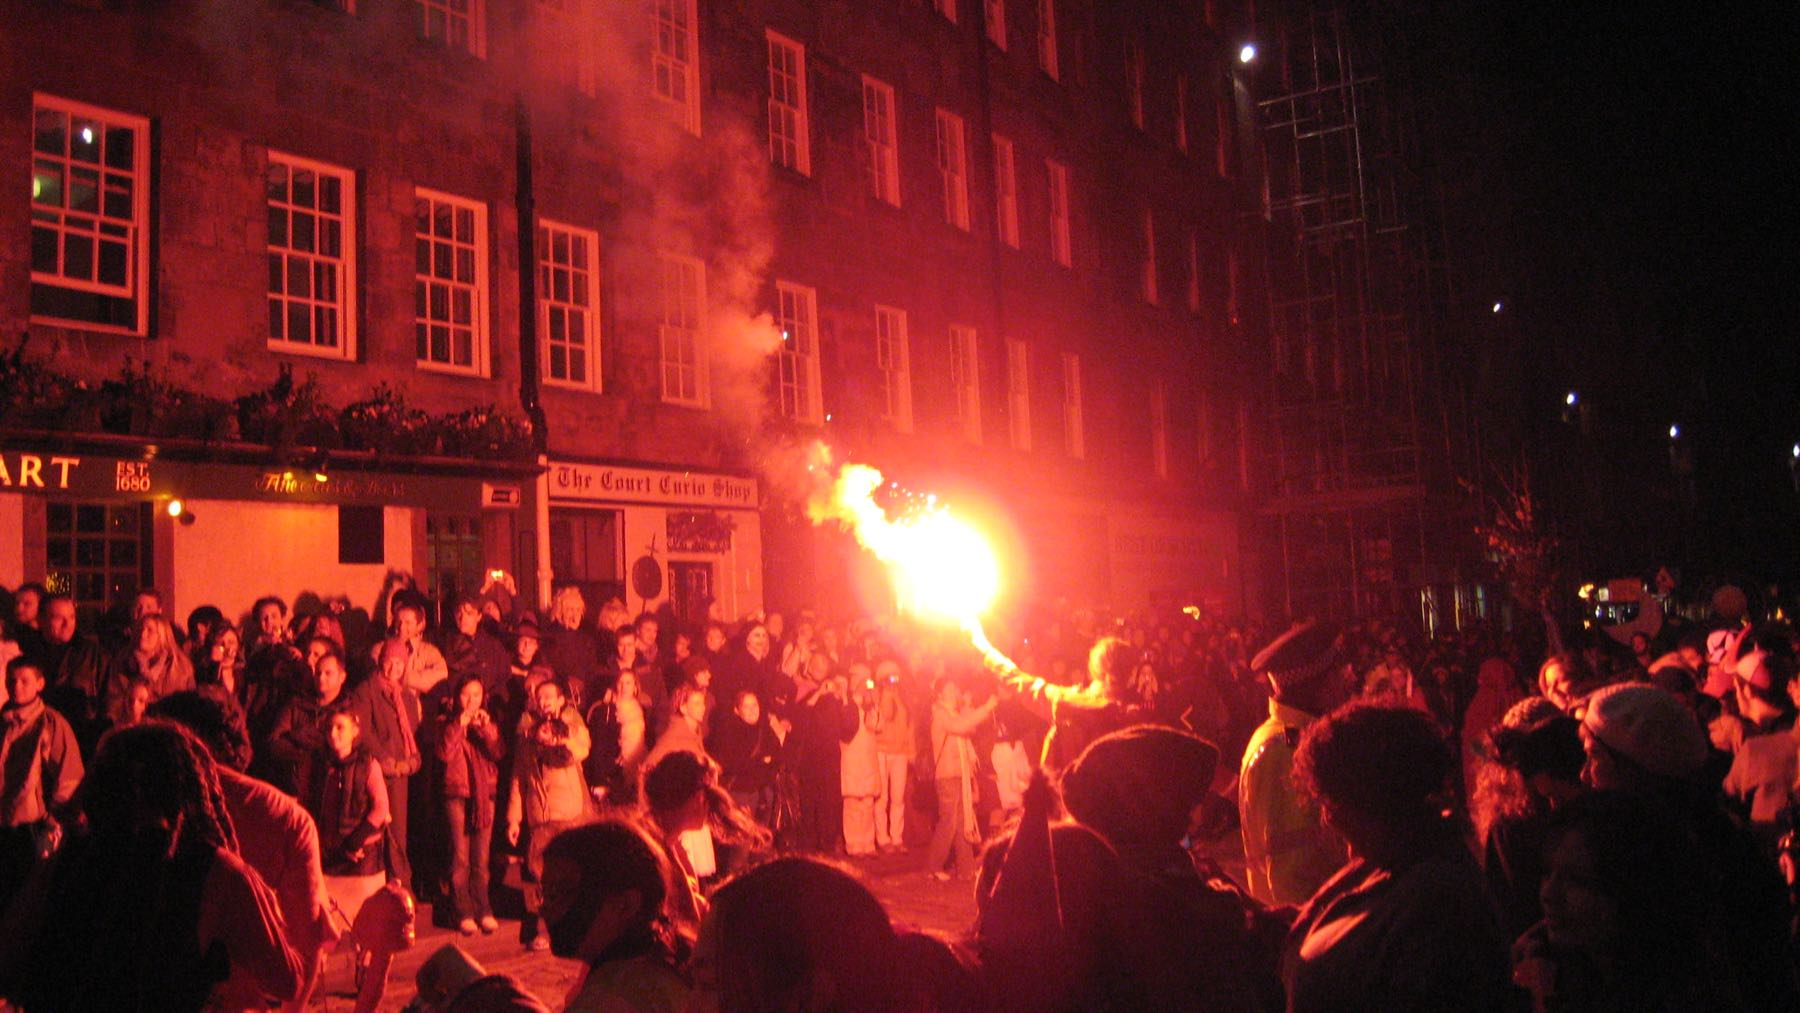 Halloweenia skotlantilaisittaiRoyal Milella. Kuva: valanzola.t, Flickr CC BY-SA 2.0